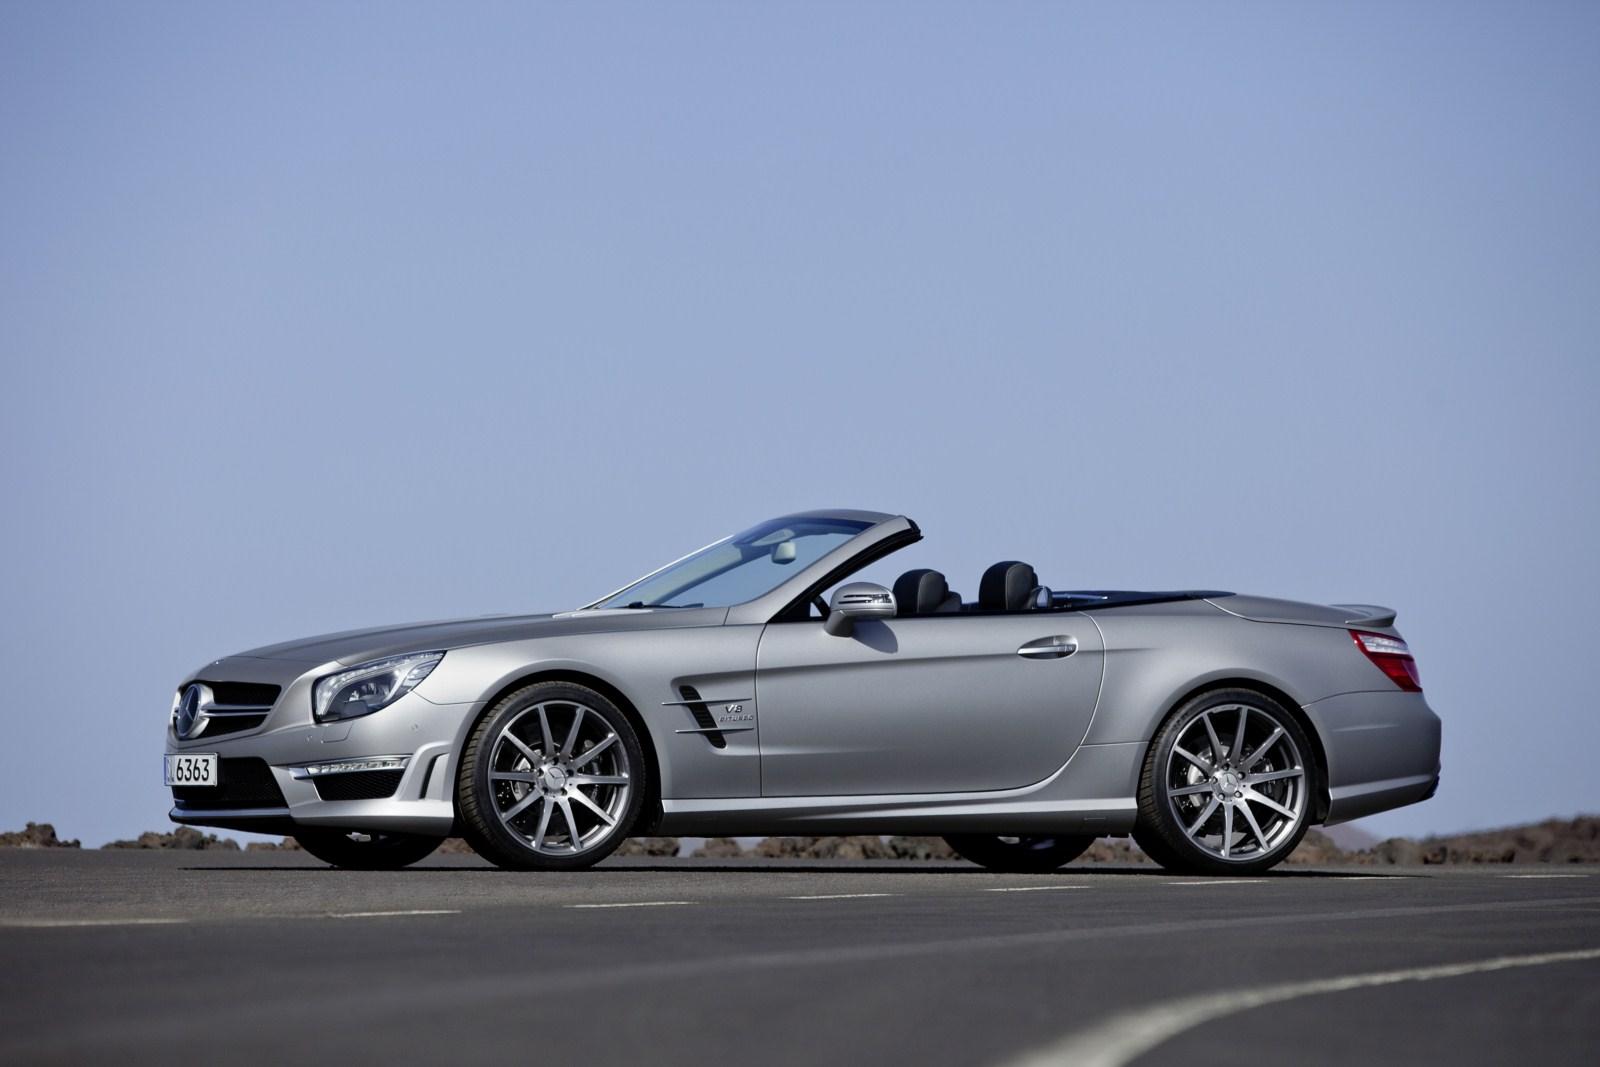 2012 mercedes benz sl63 amg convertible official garage car for Mercedes benz convertible tops